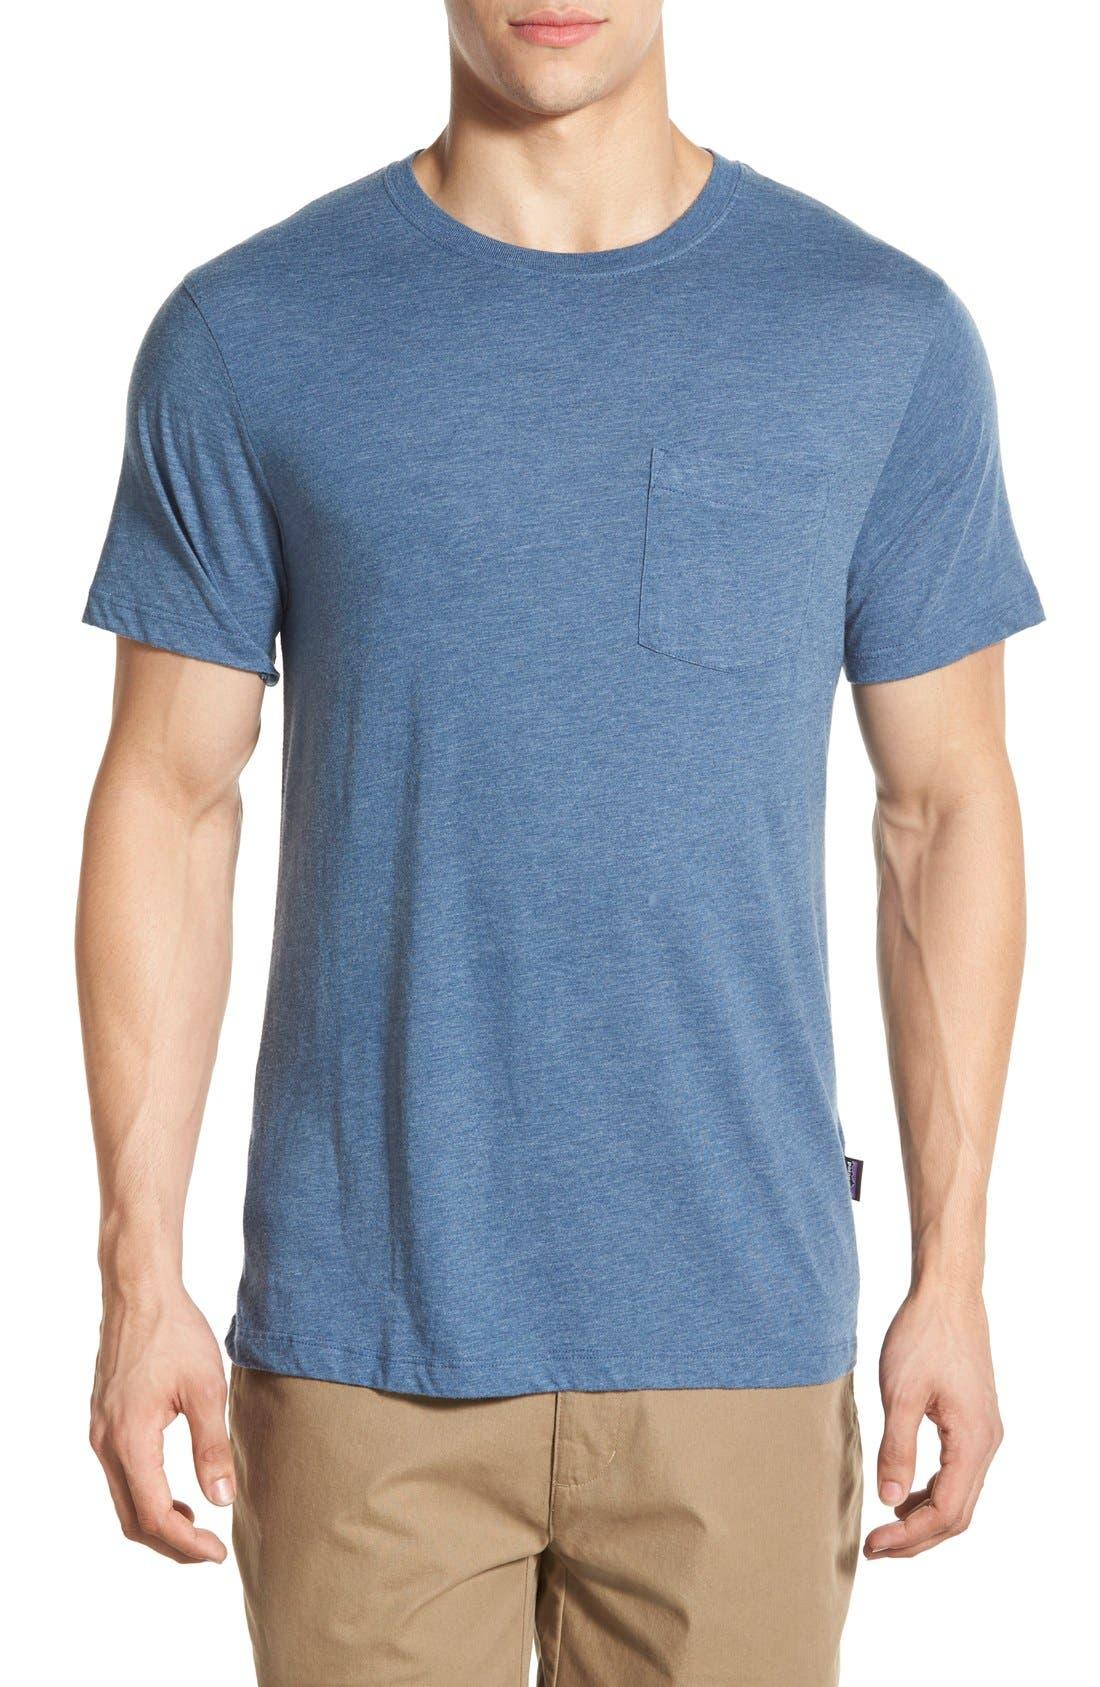 Alternate Image 1 Selected - Patagonia 'Daily Triblend' Pocket T-Shirt